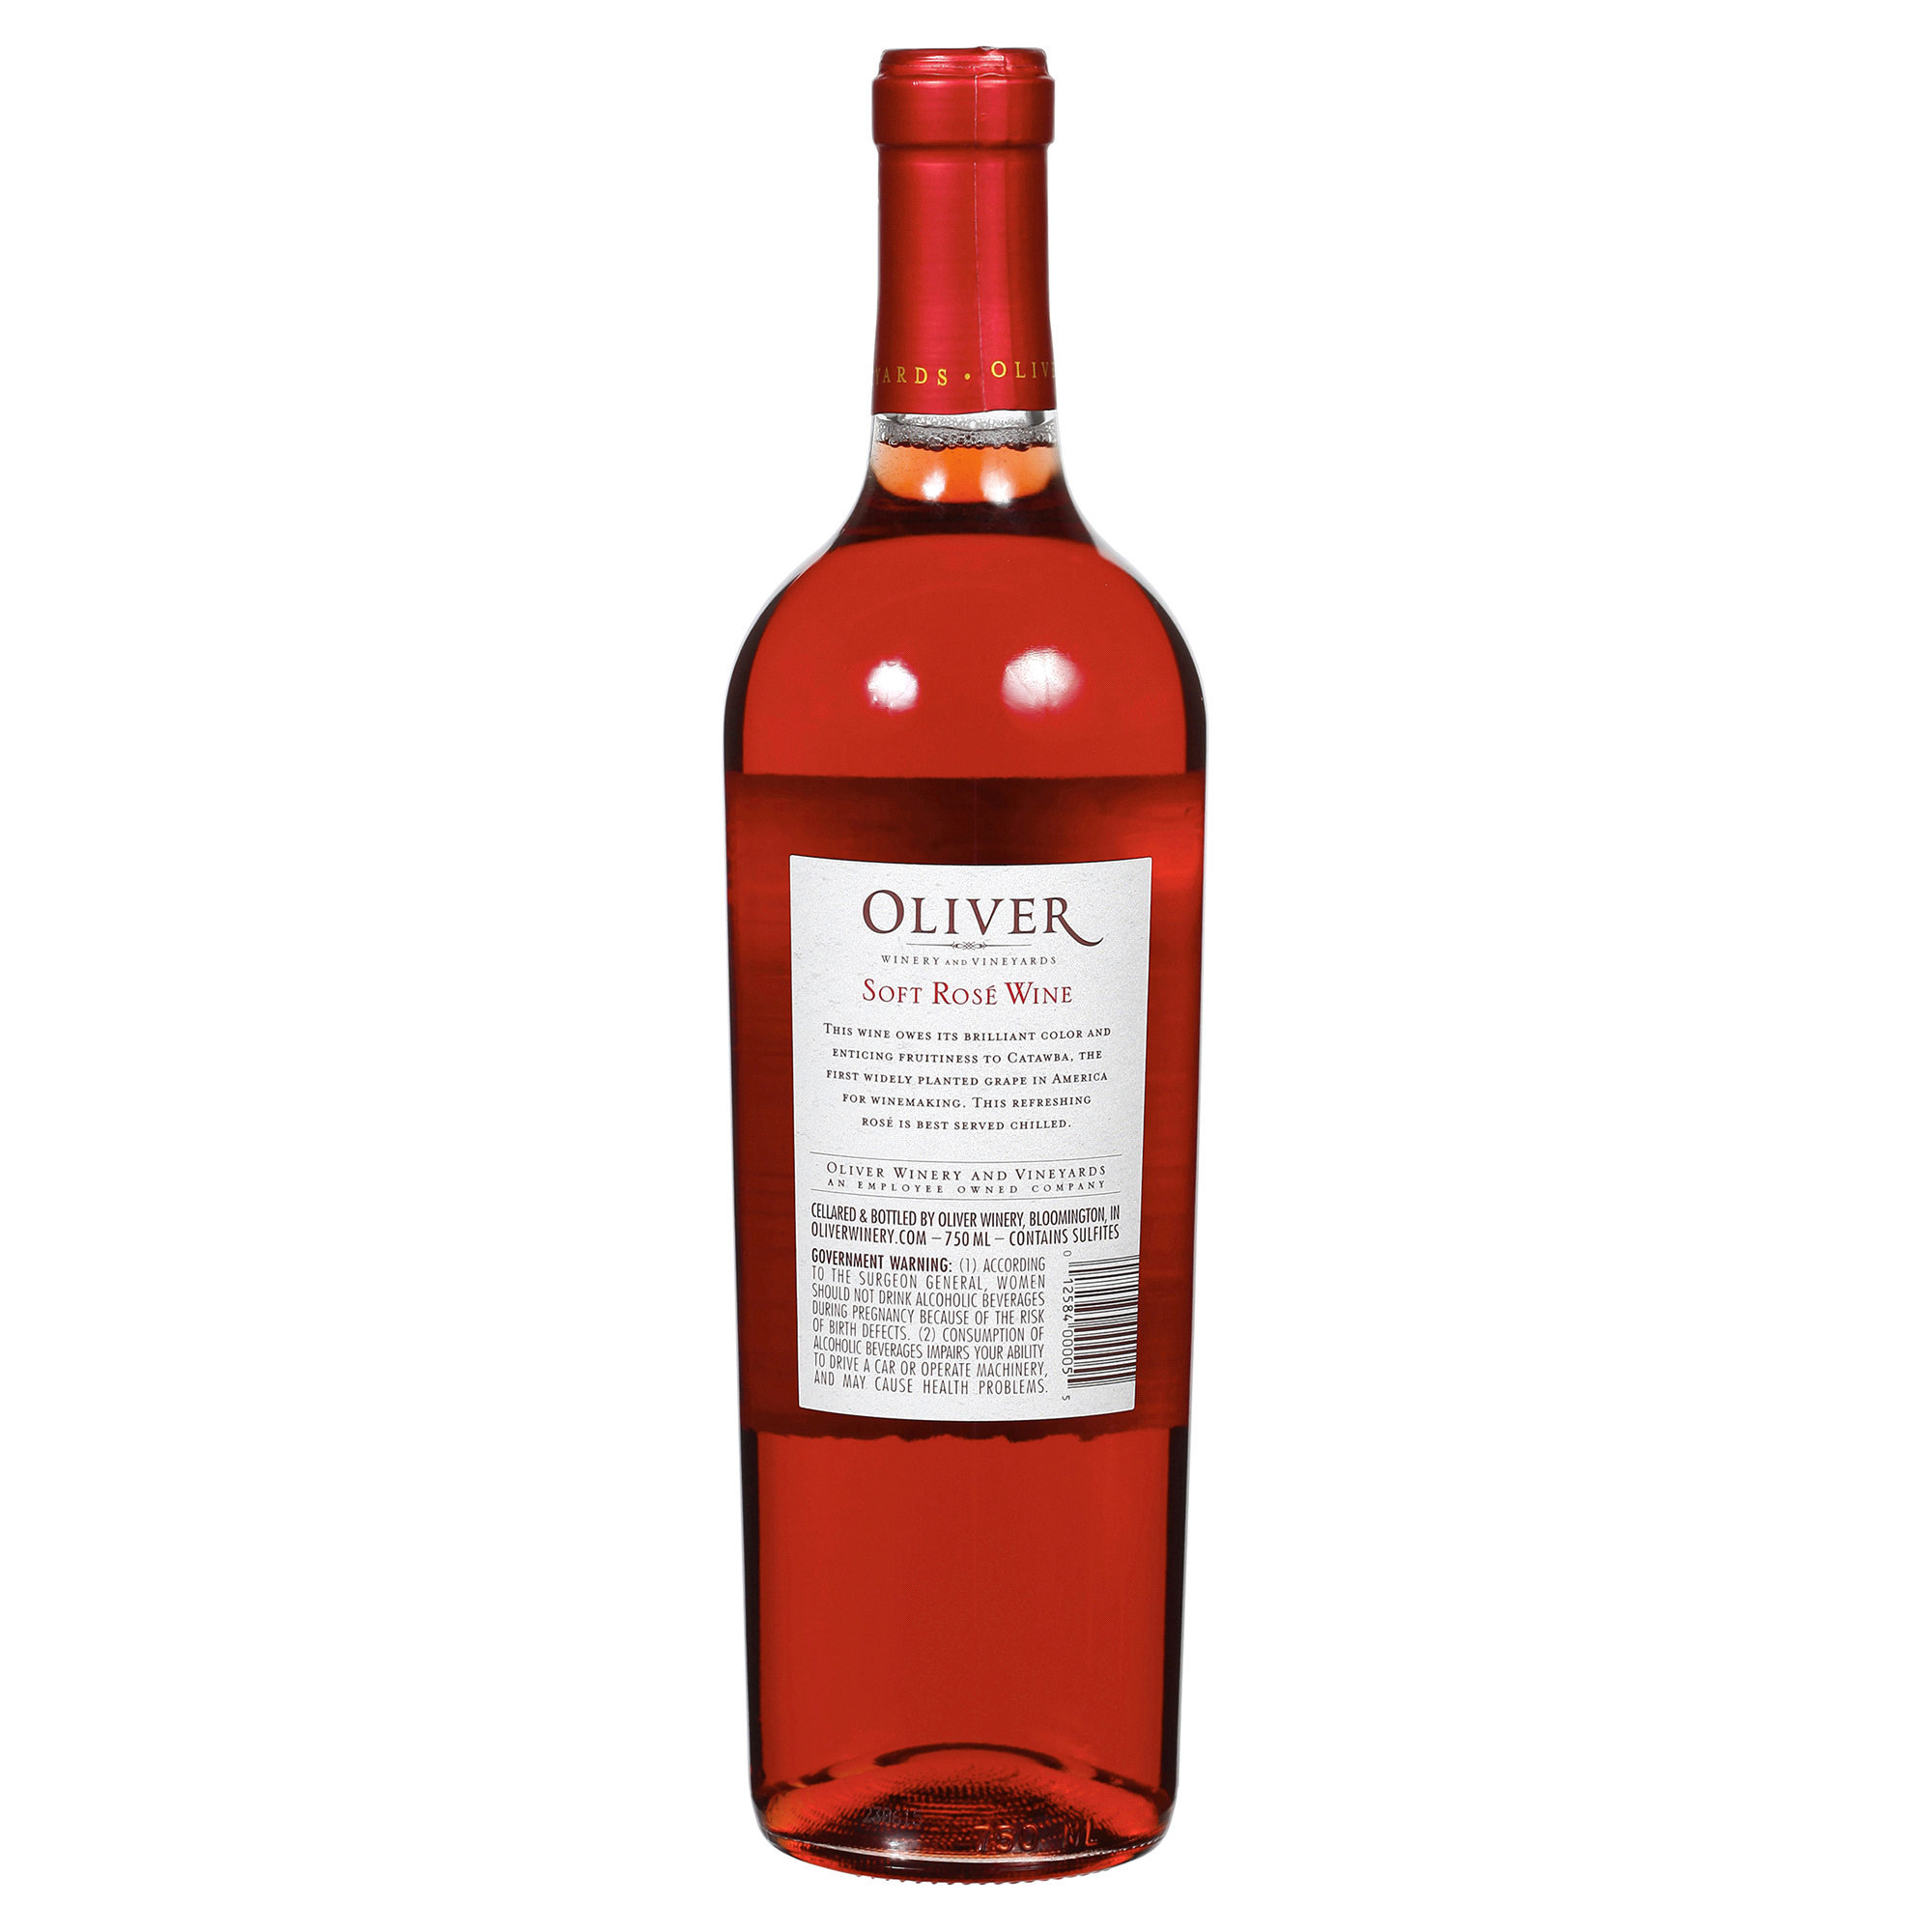 Oliver Soft Rose Wine 750 ml | Meijer.com